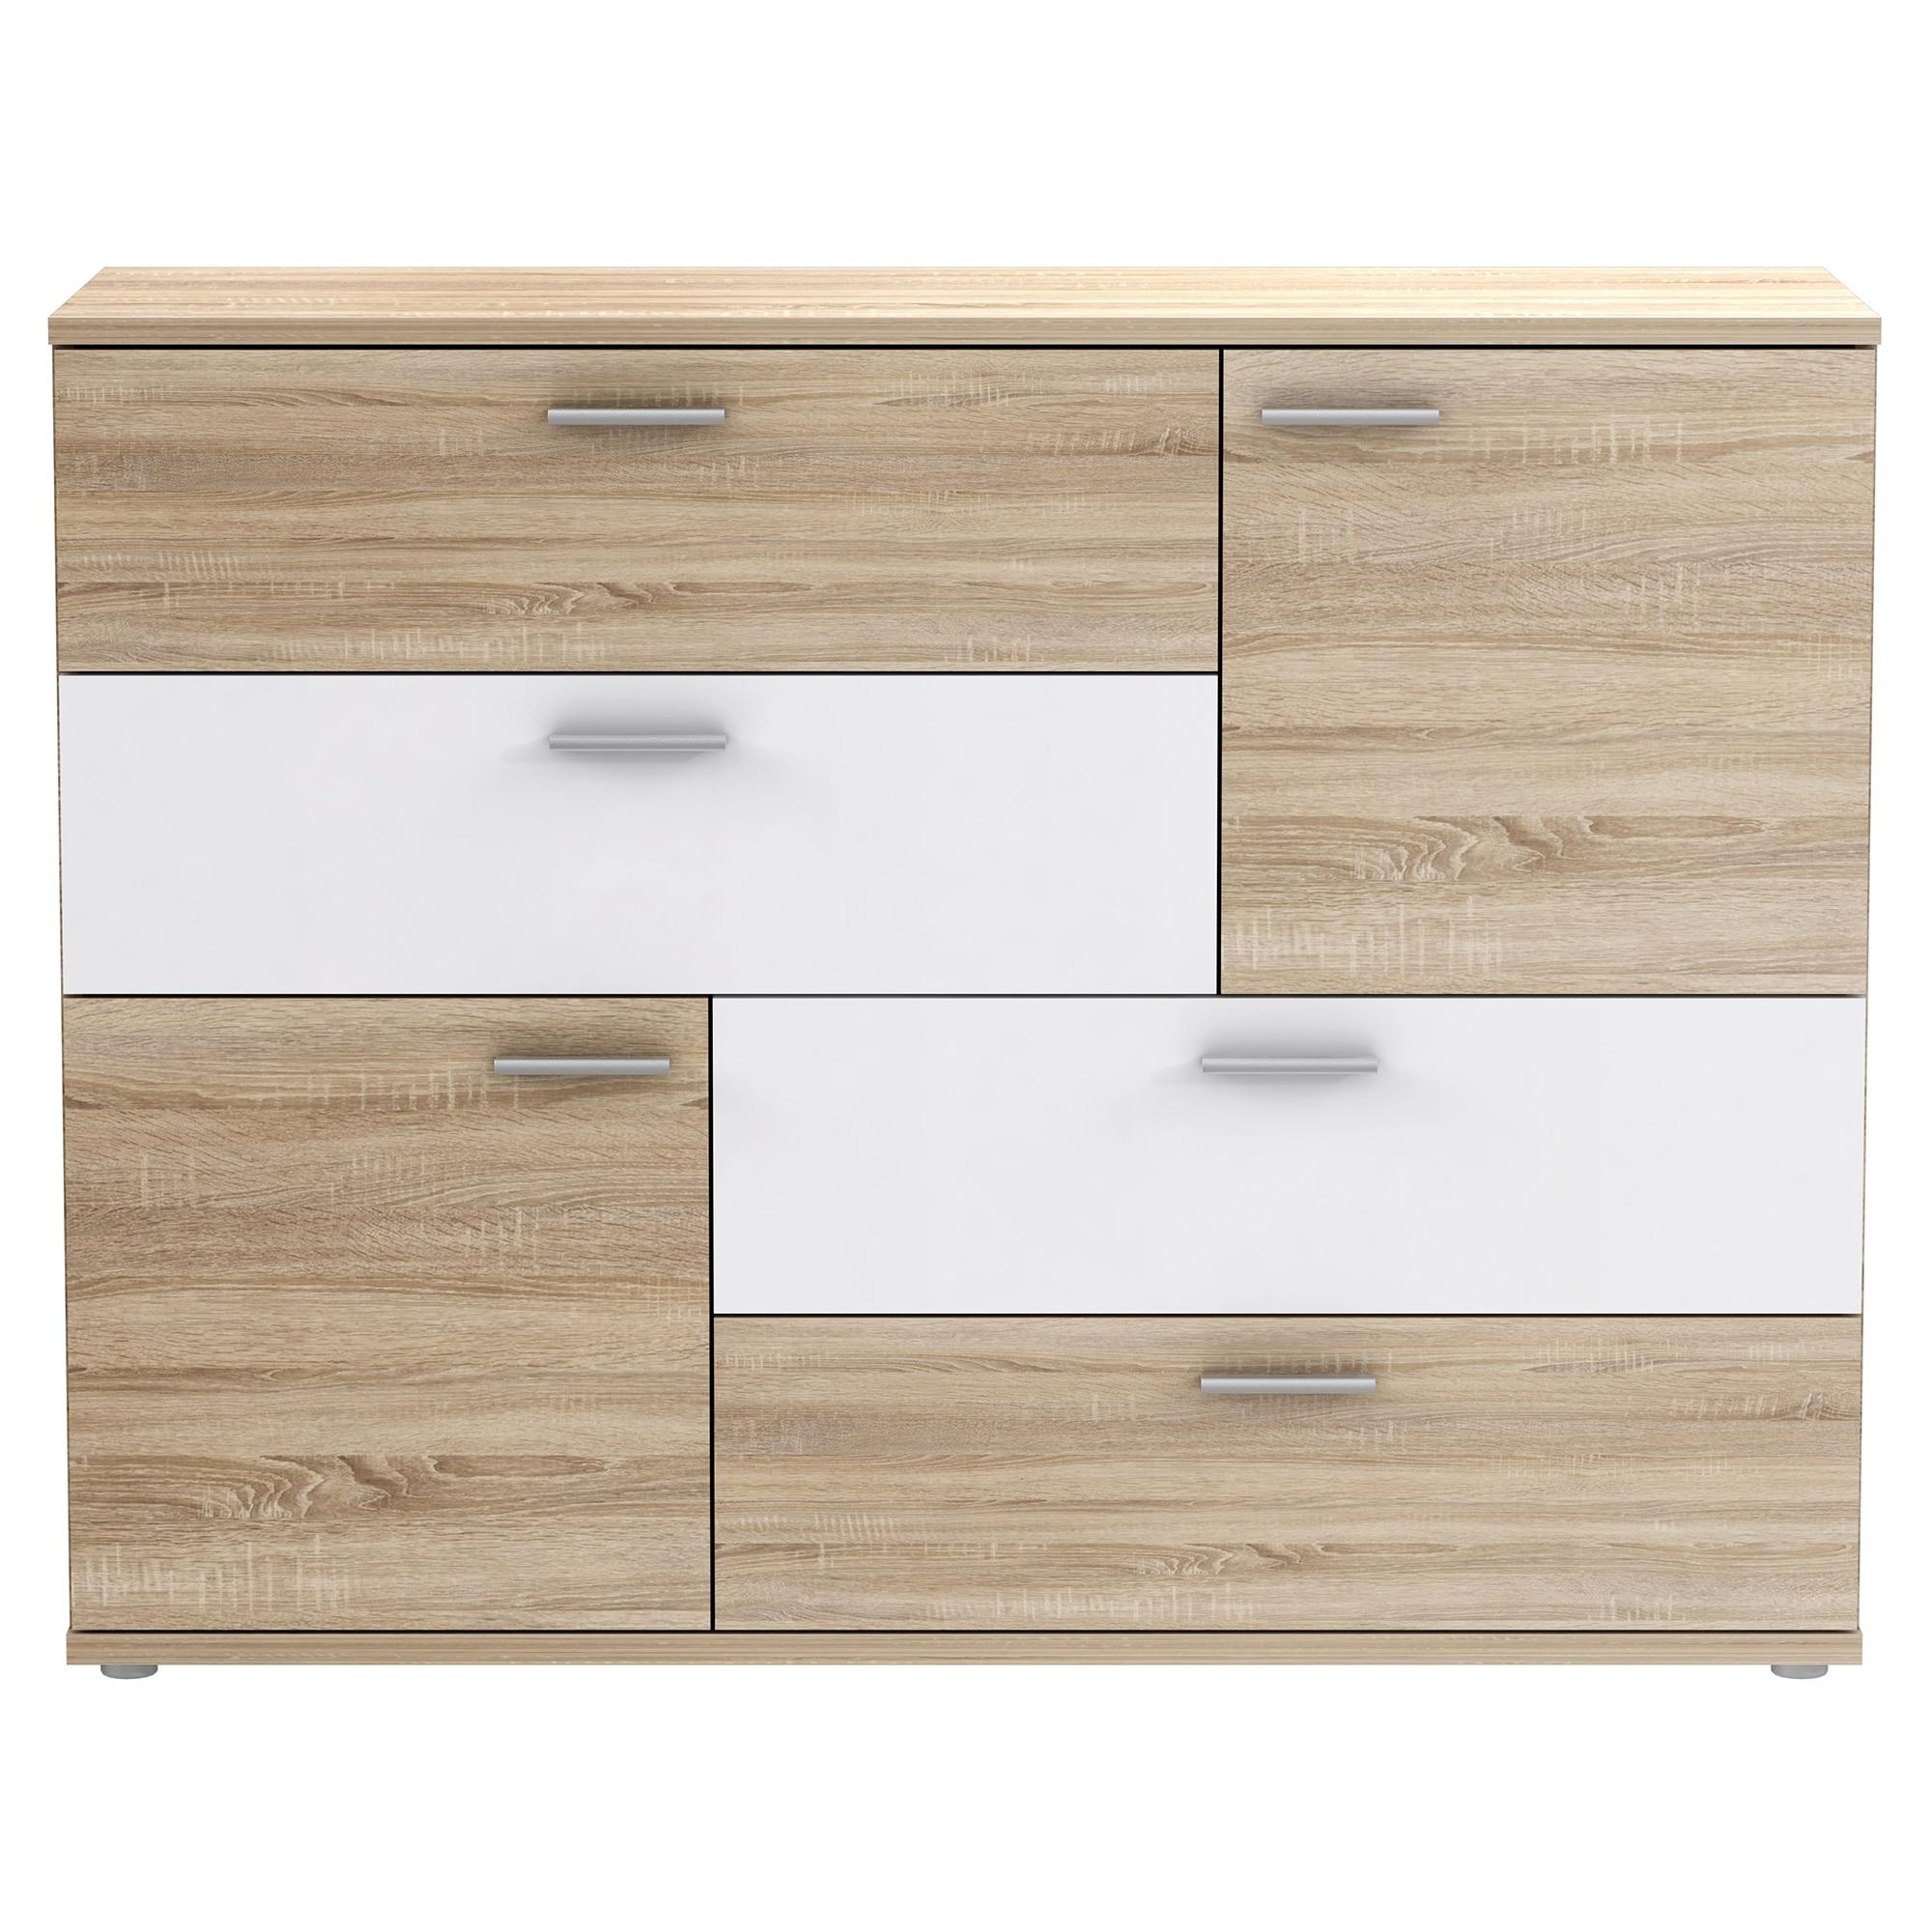 Fotografie Comoda Kring Tetris, 125x96x41.3 cm, culoare stejar sonoma/alb, 4 sertare 2 usi